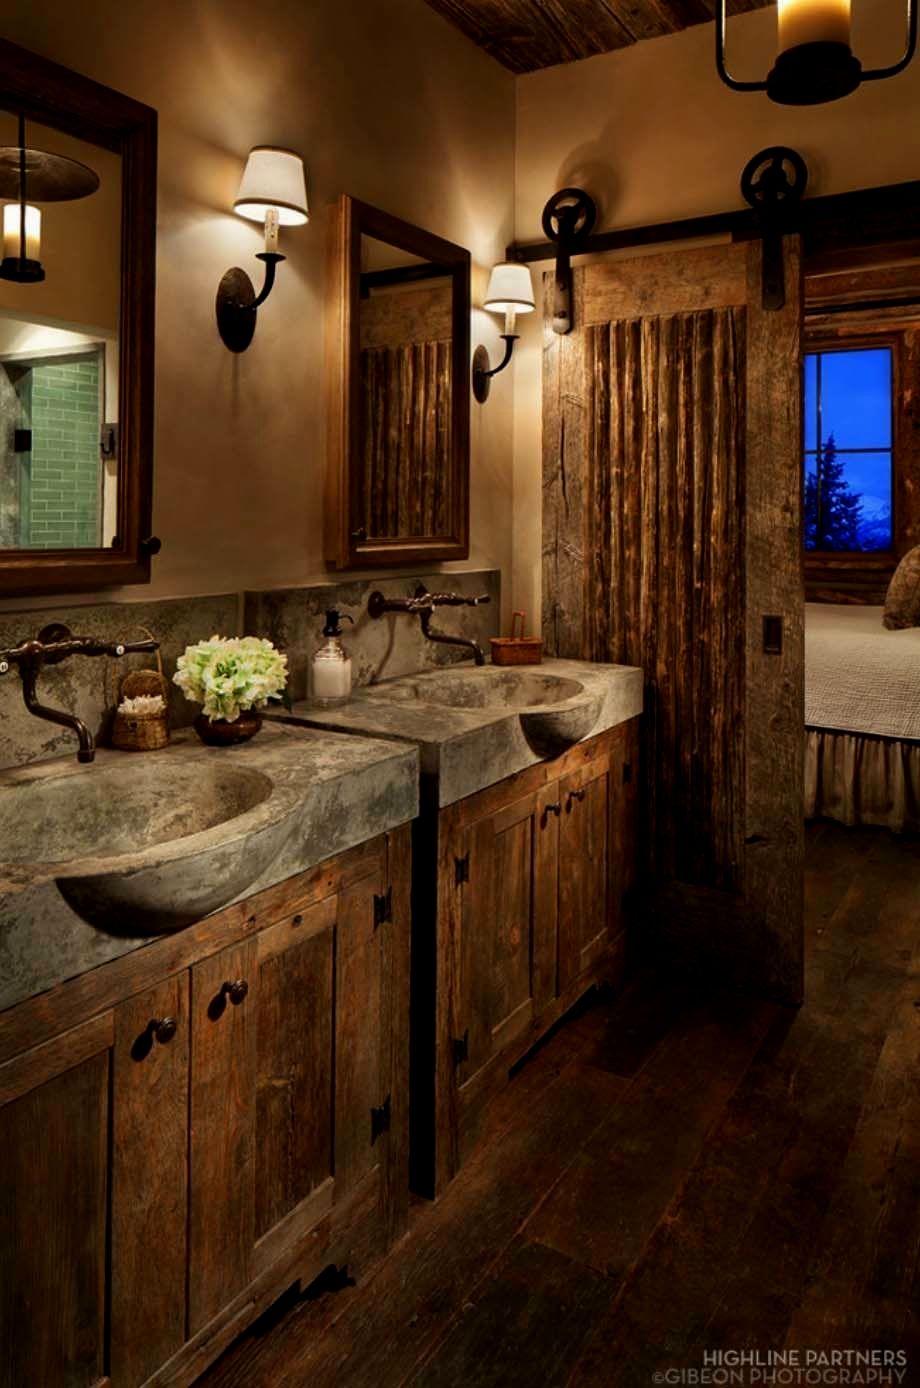 beautiful bathroom wall storage cabinets decoration-Latest Bathroom Wall Storage Cabinets Décor